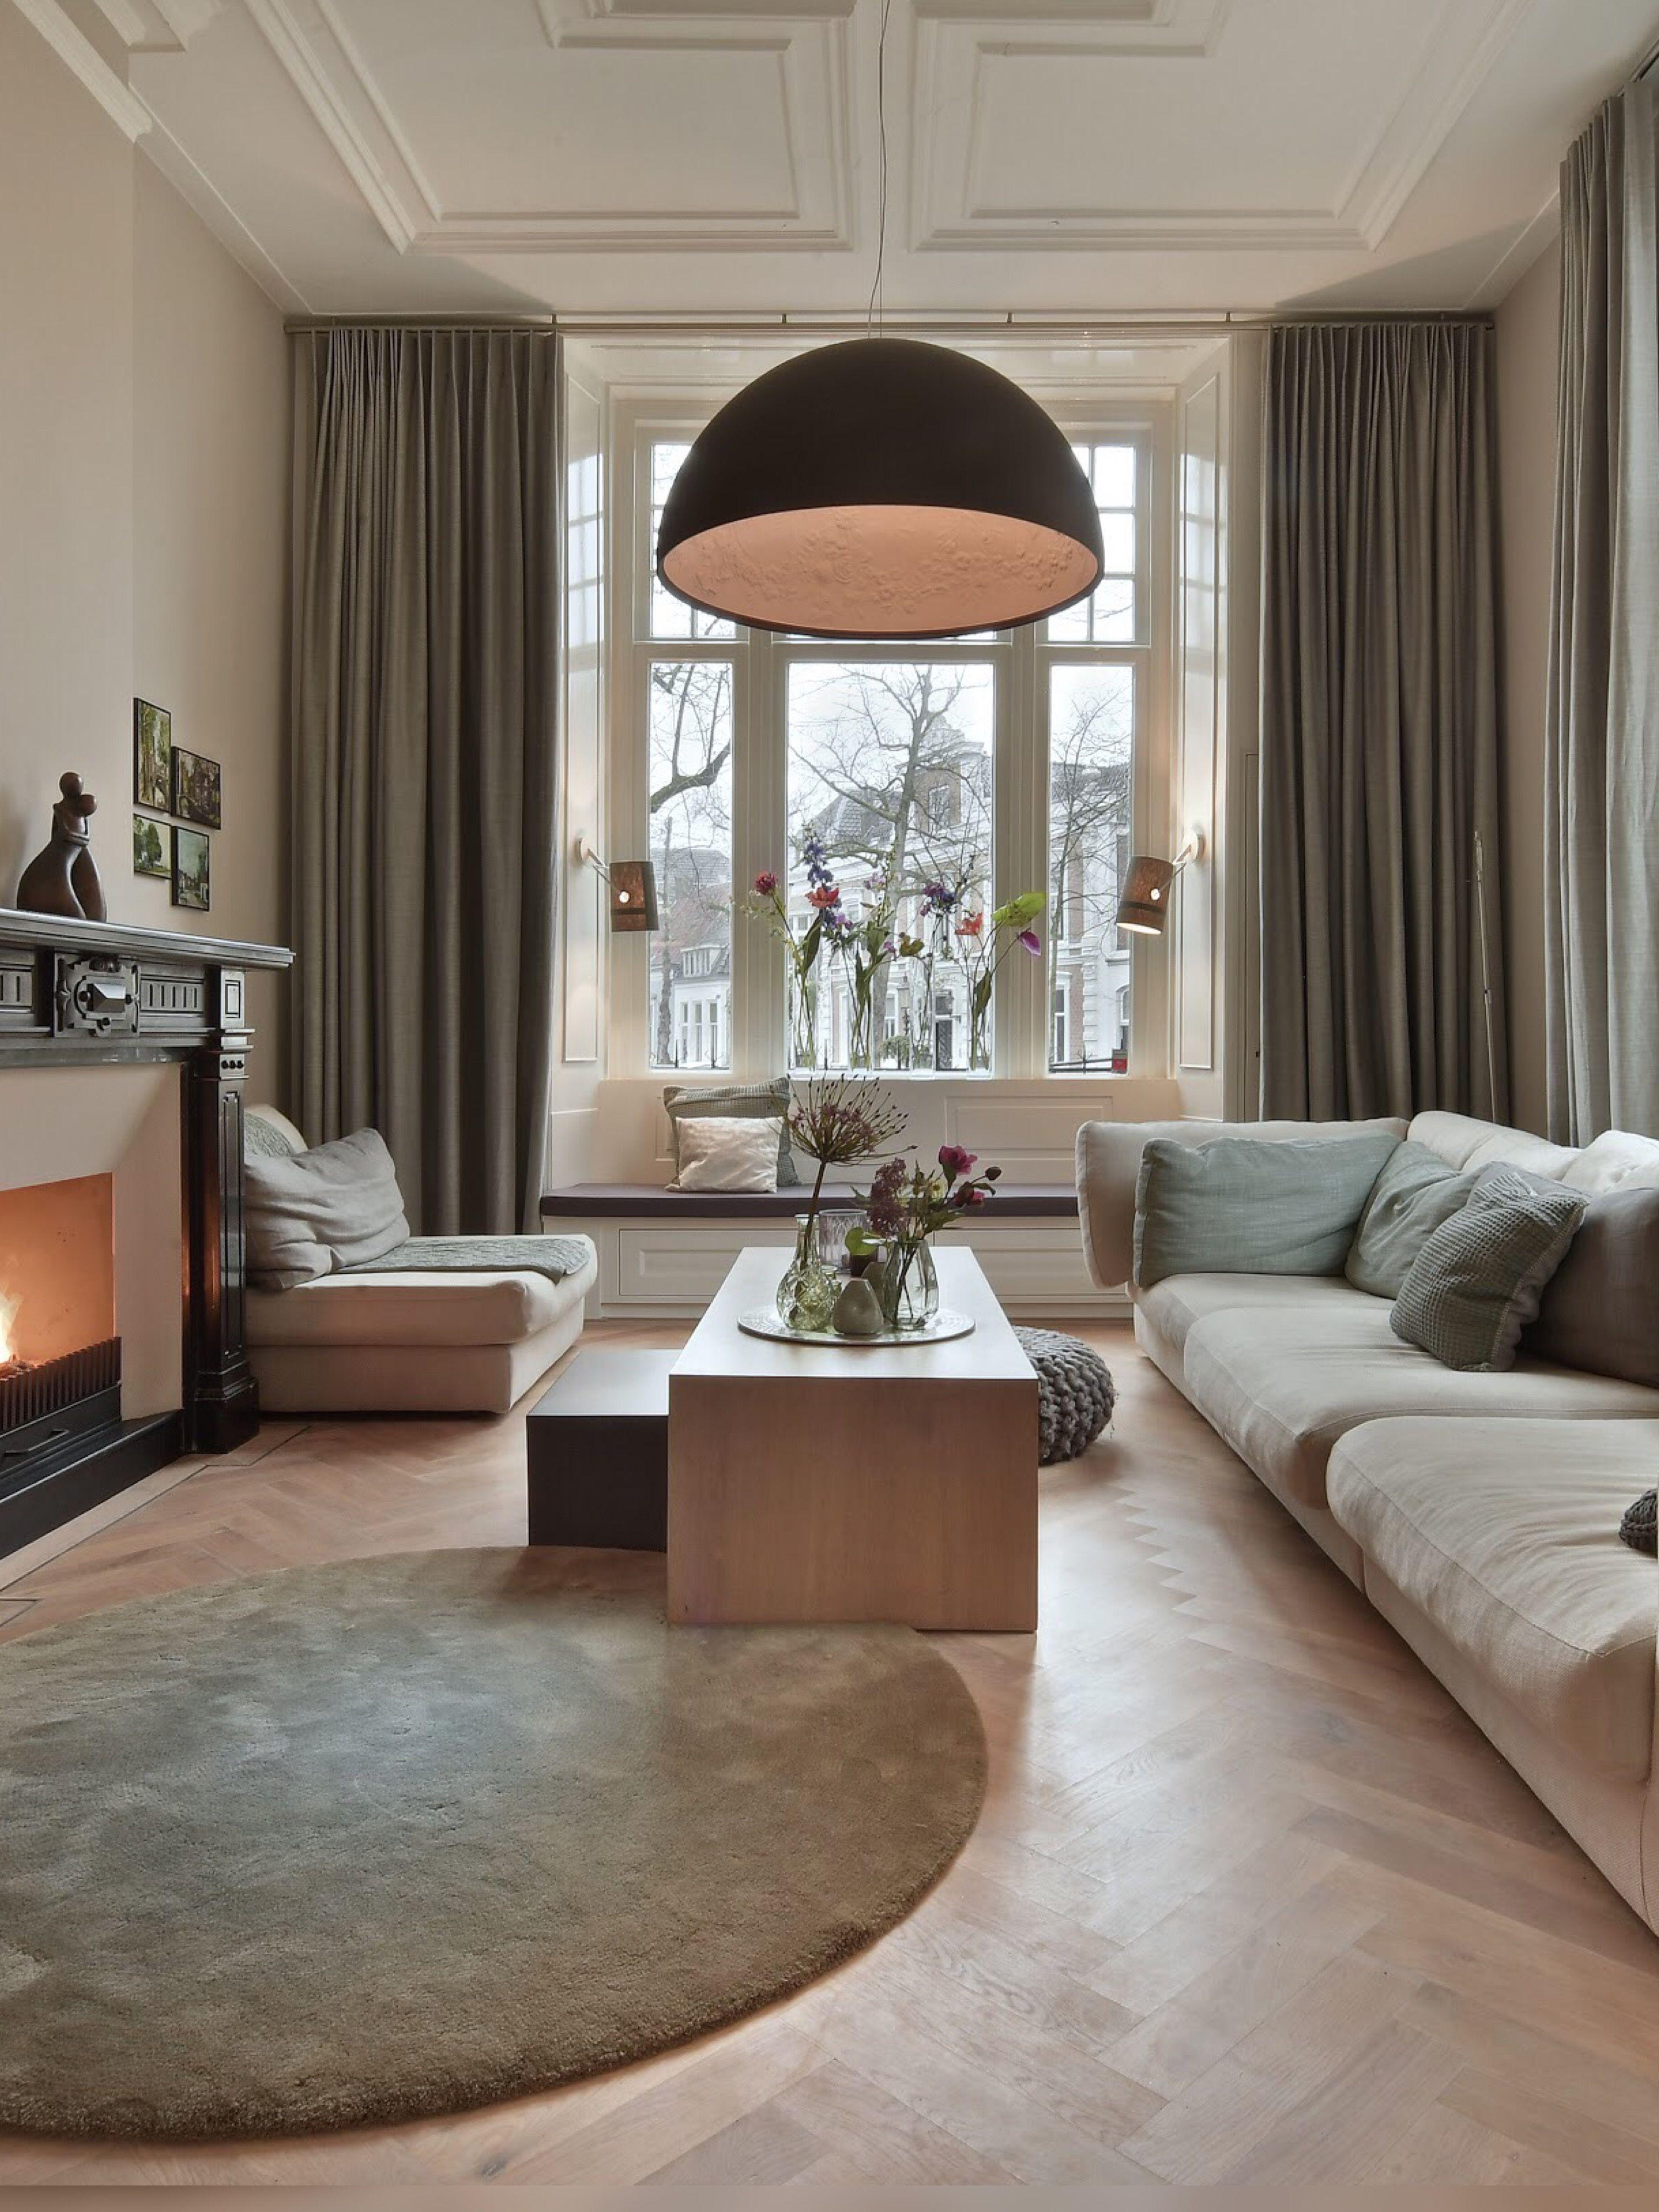 Cheap Romantic Home Decor - SalePrice:16$